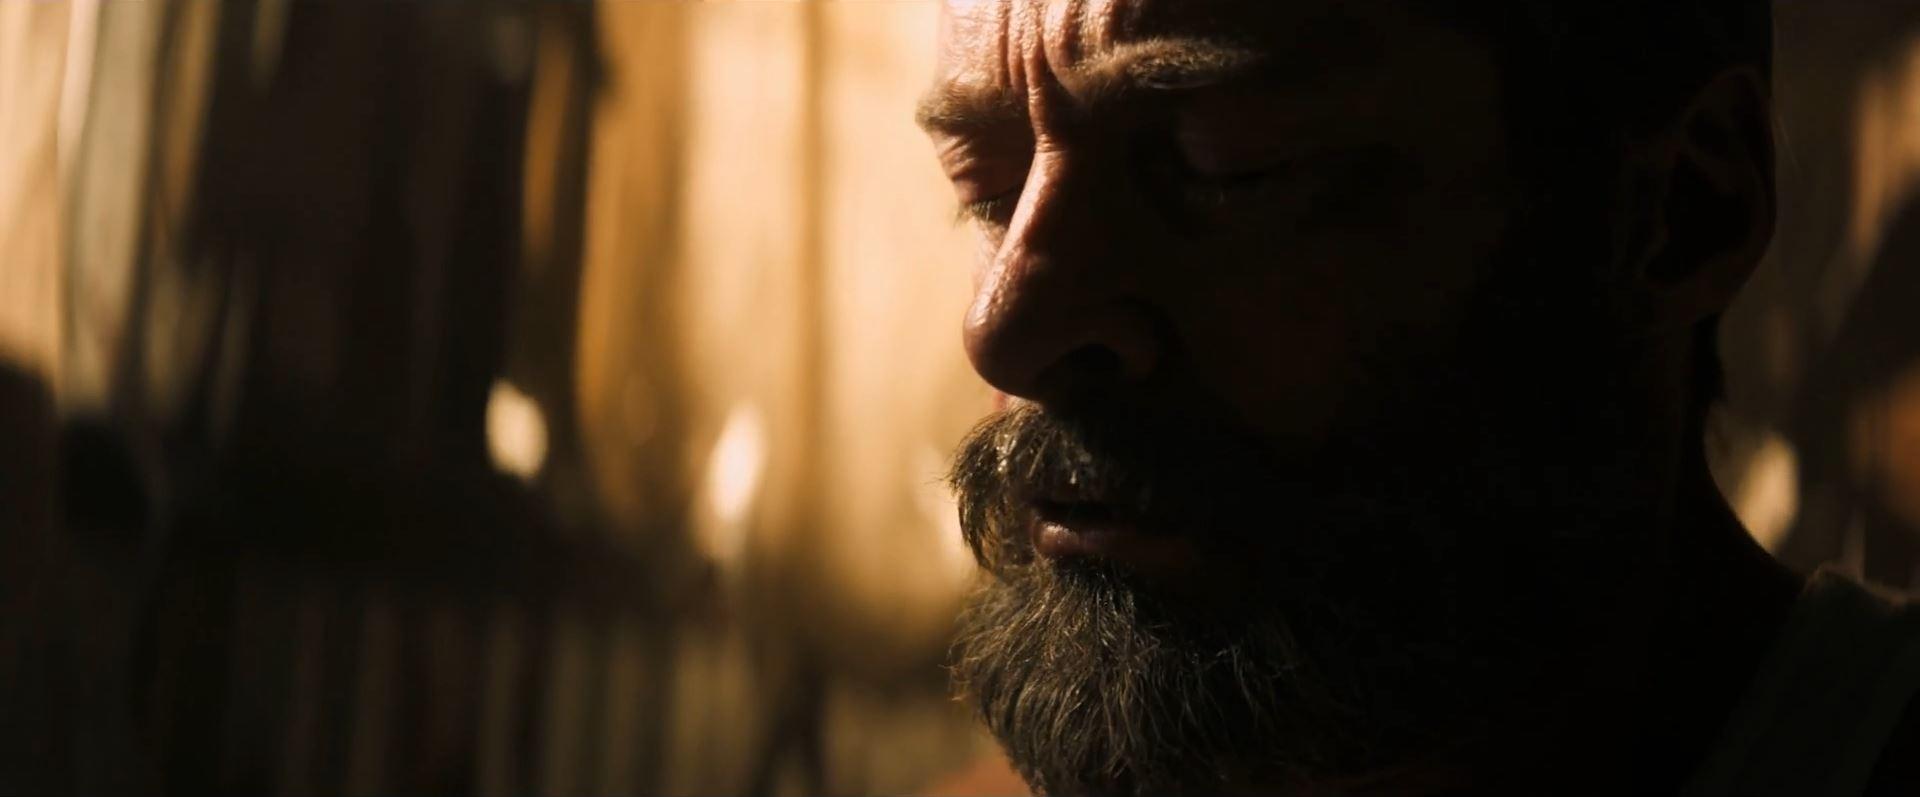 Hugh Jackman as Wolverine in Logan - Super Bowl Trailers